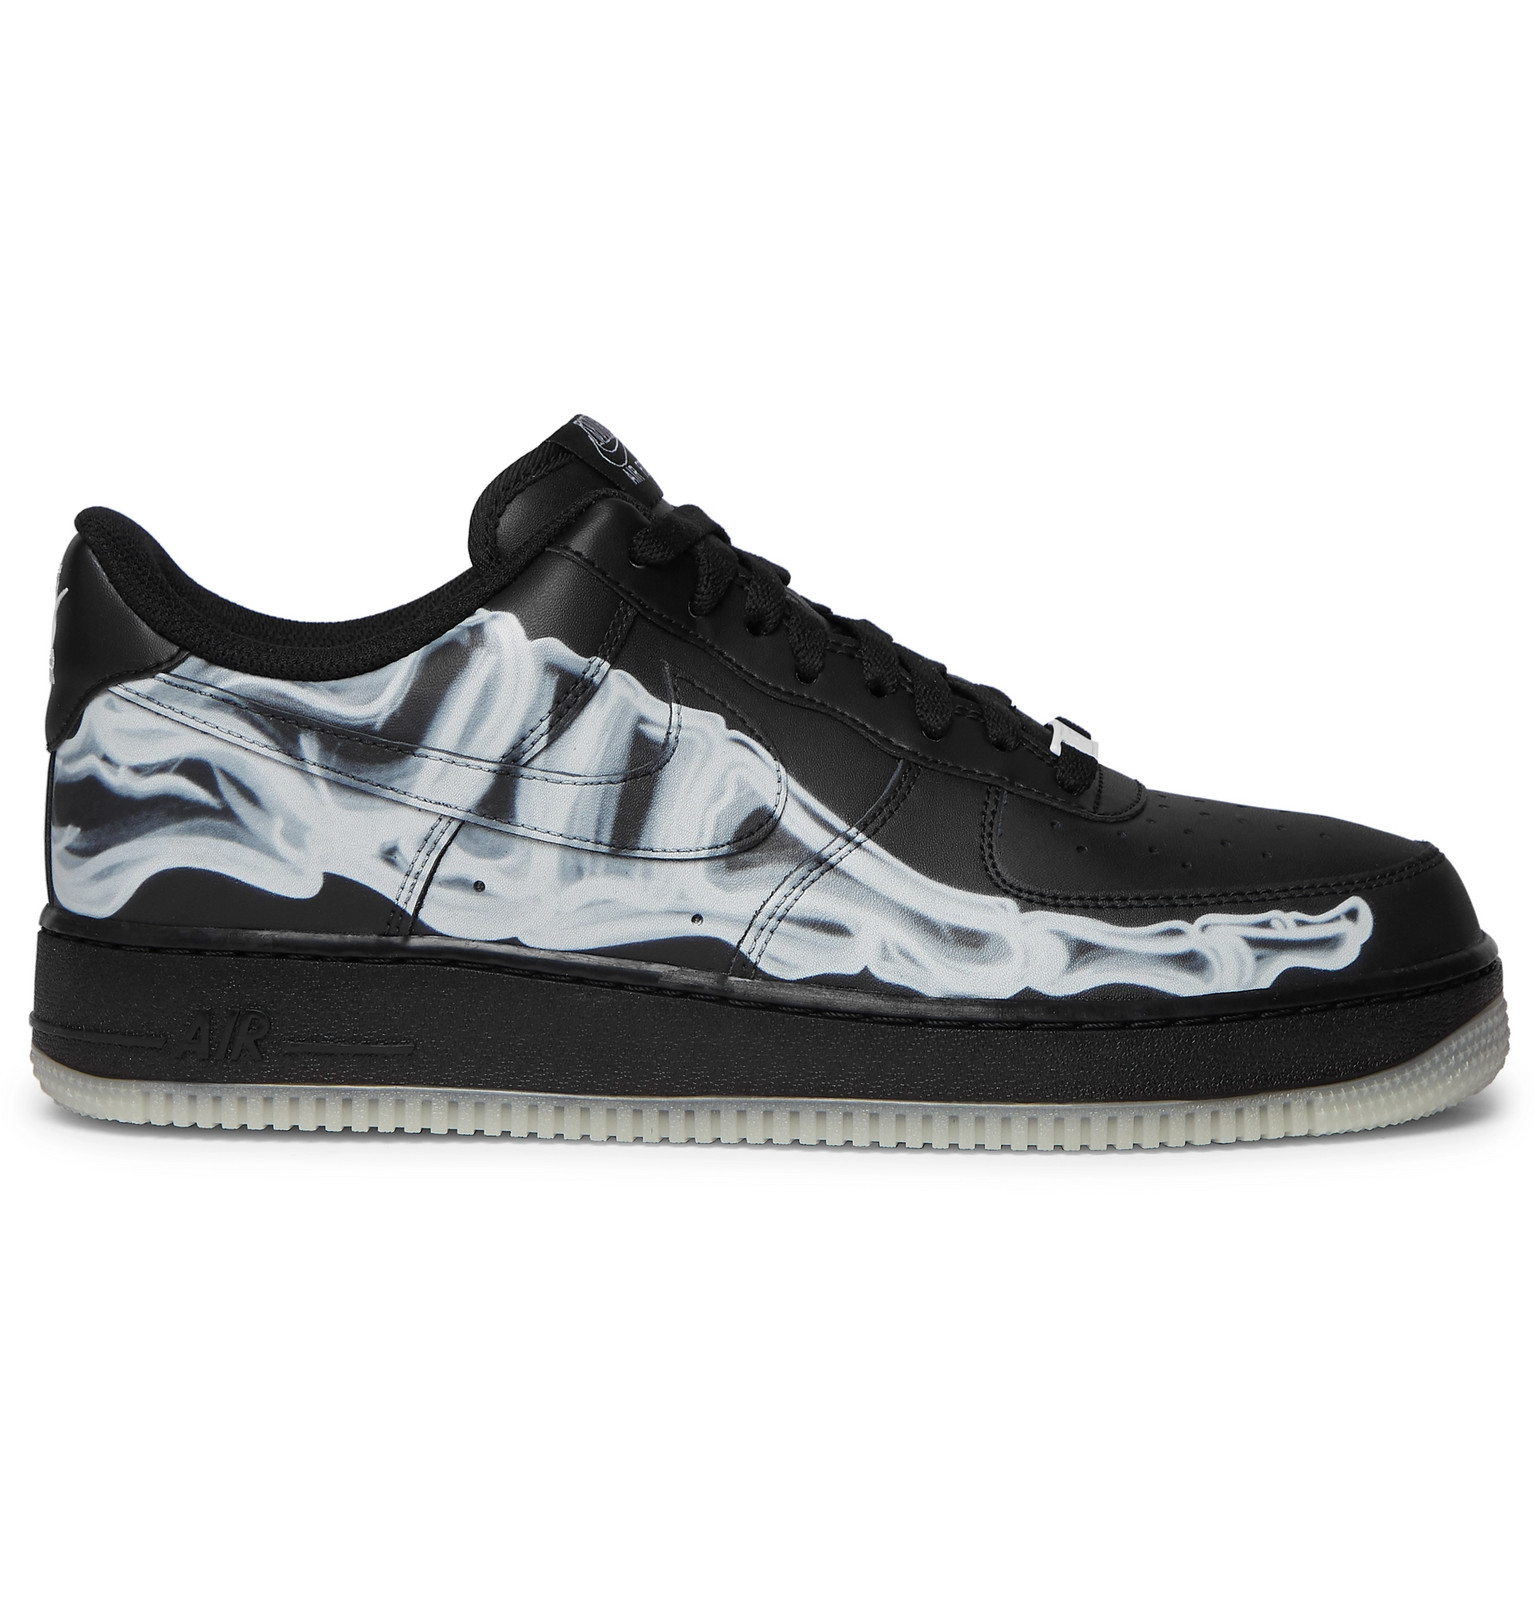 Nike Air Force 1 '07 Skeleton Leather Sneakers